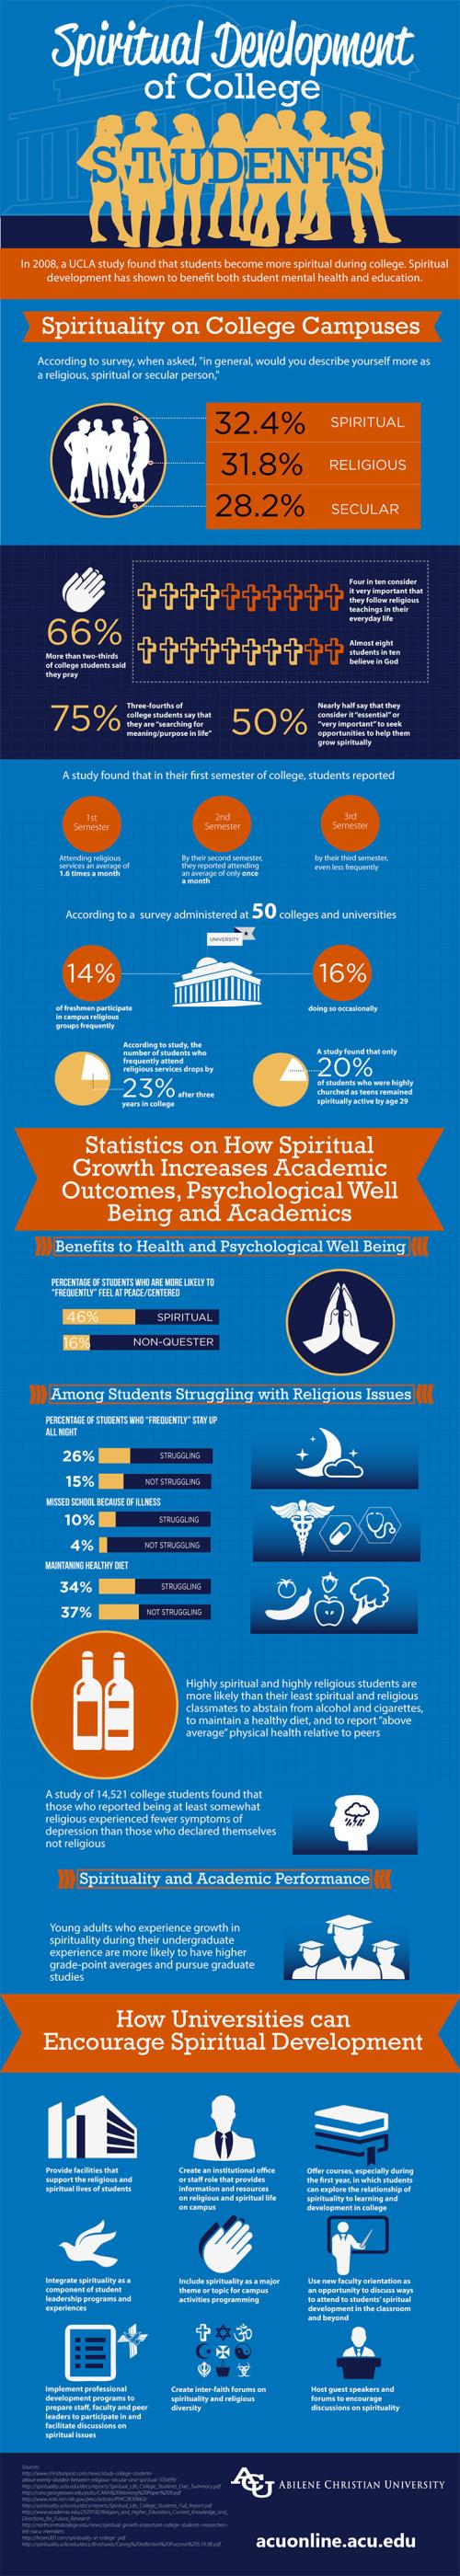 Encouraging-spiritual-development-of-college-students